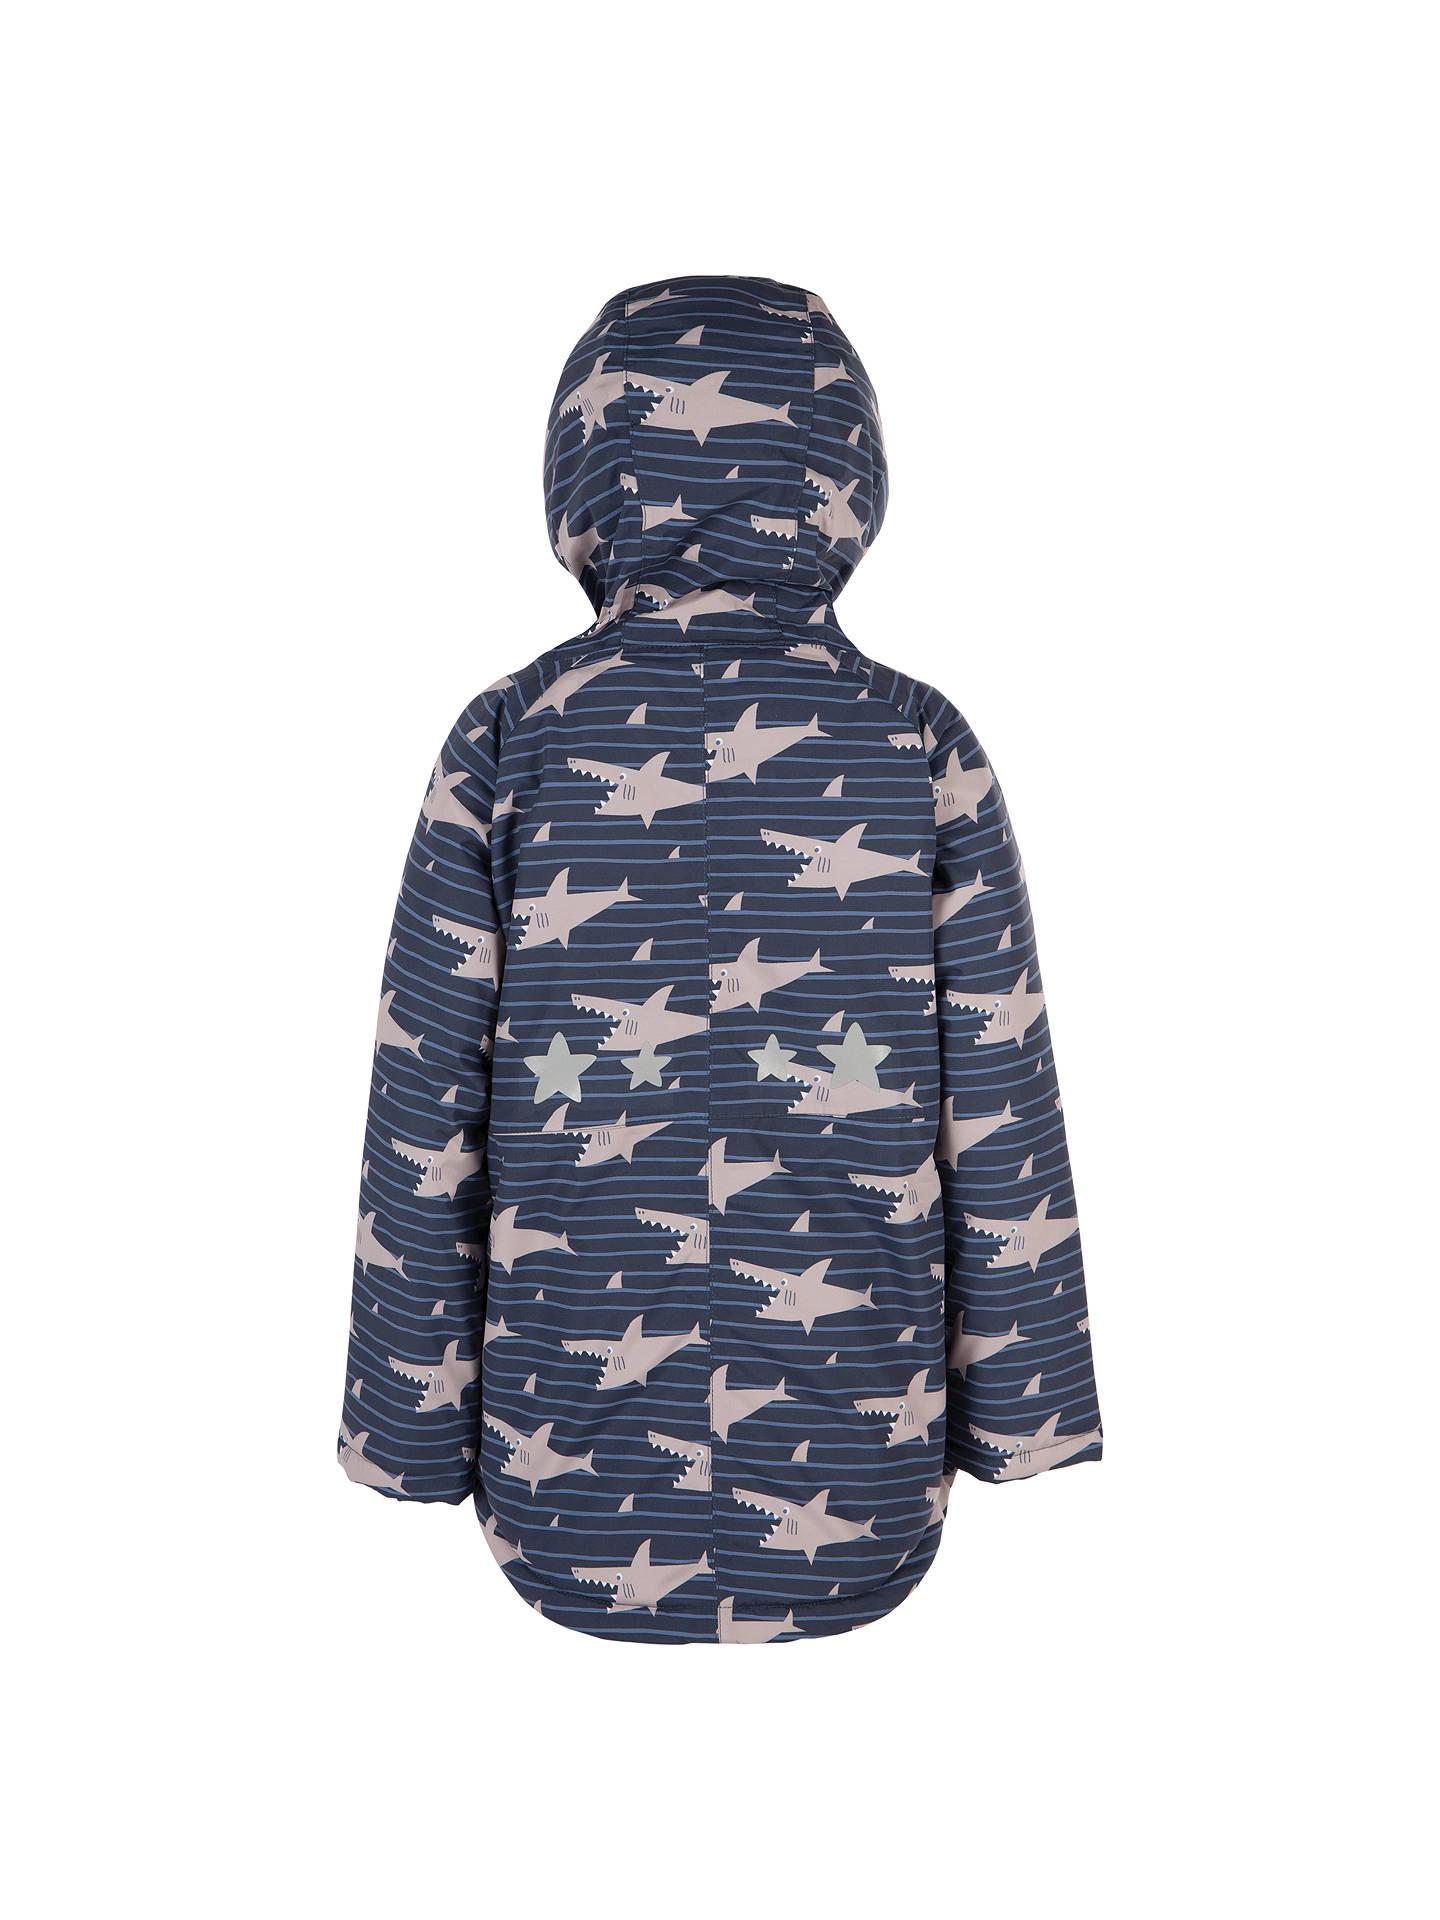 732bd5cad ... Buy Frugi Organic Children's Waterproof Shark Jacket, Blue/Grey, 1-2  years ...